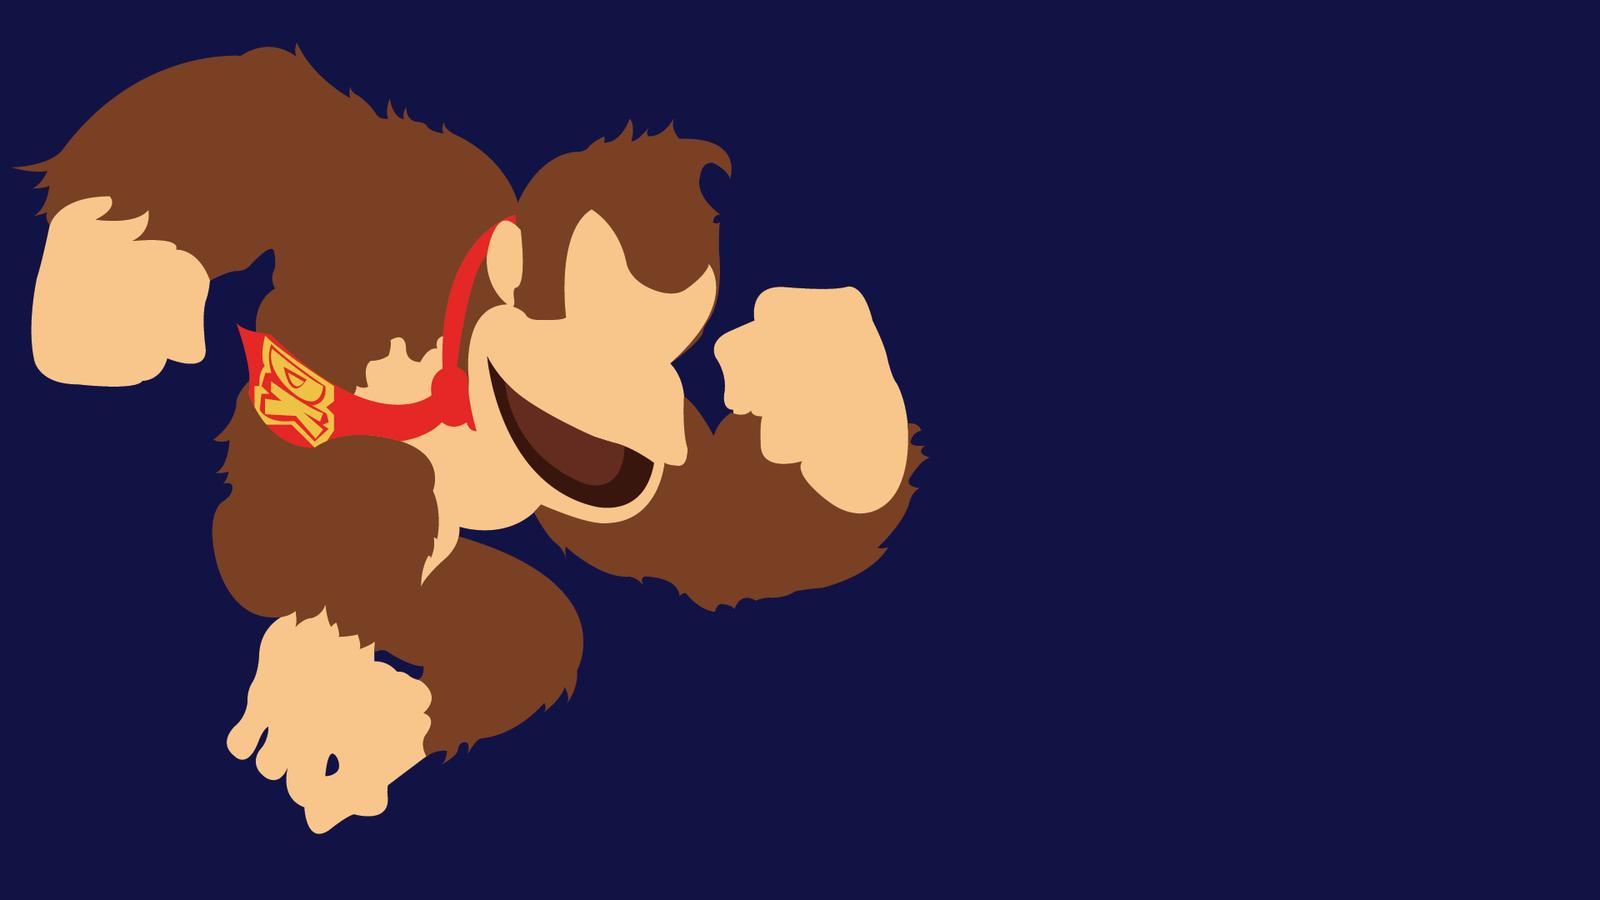 1600x900 Donkey Kong By Bloodruns4ever